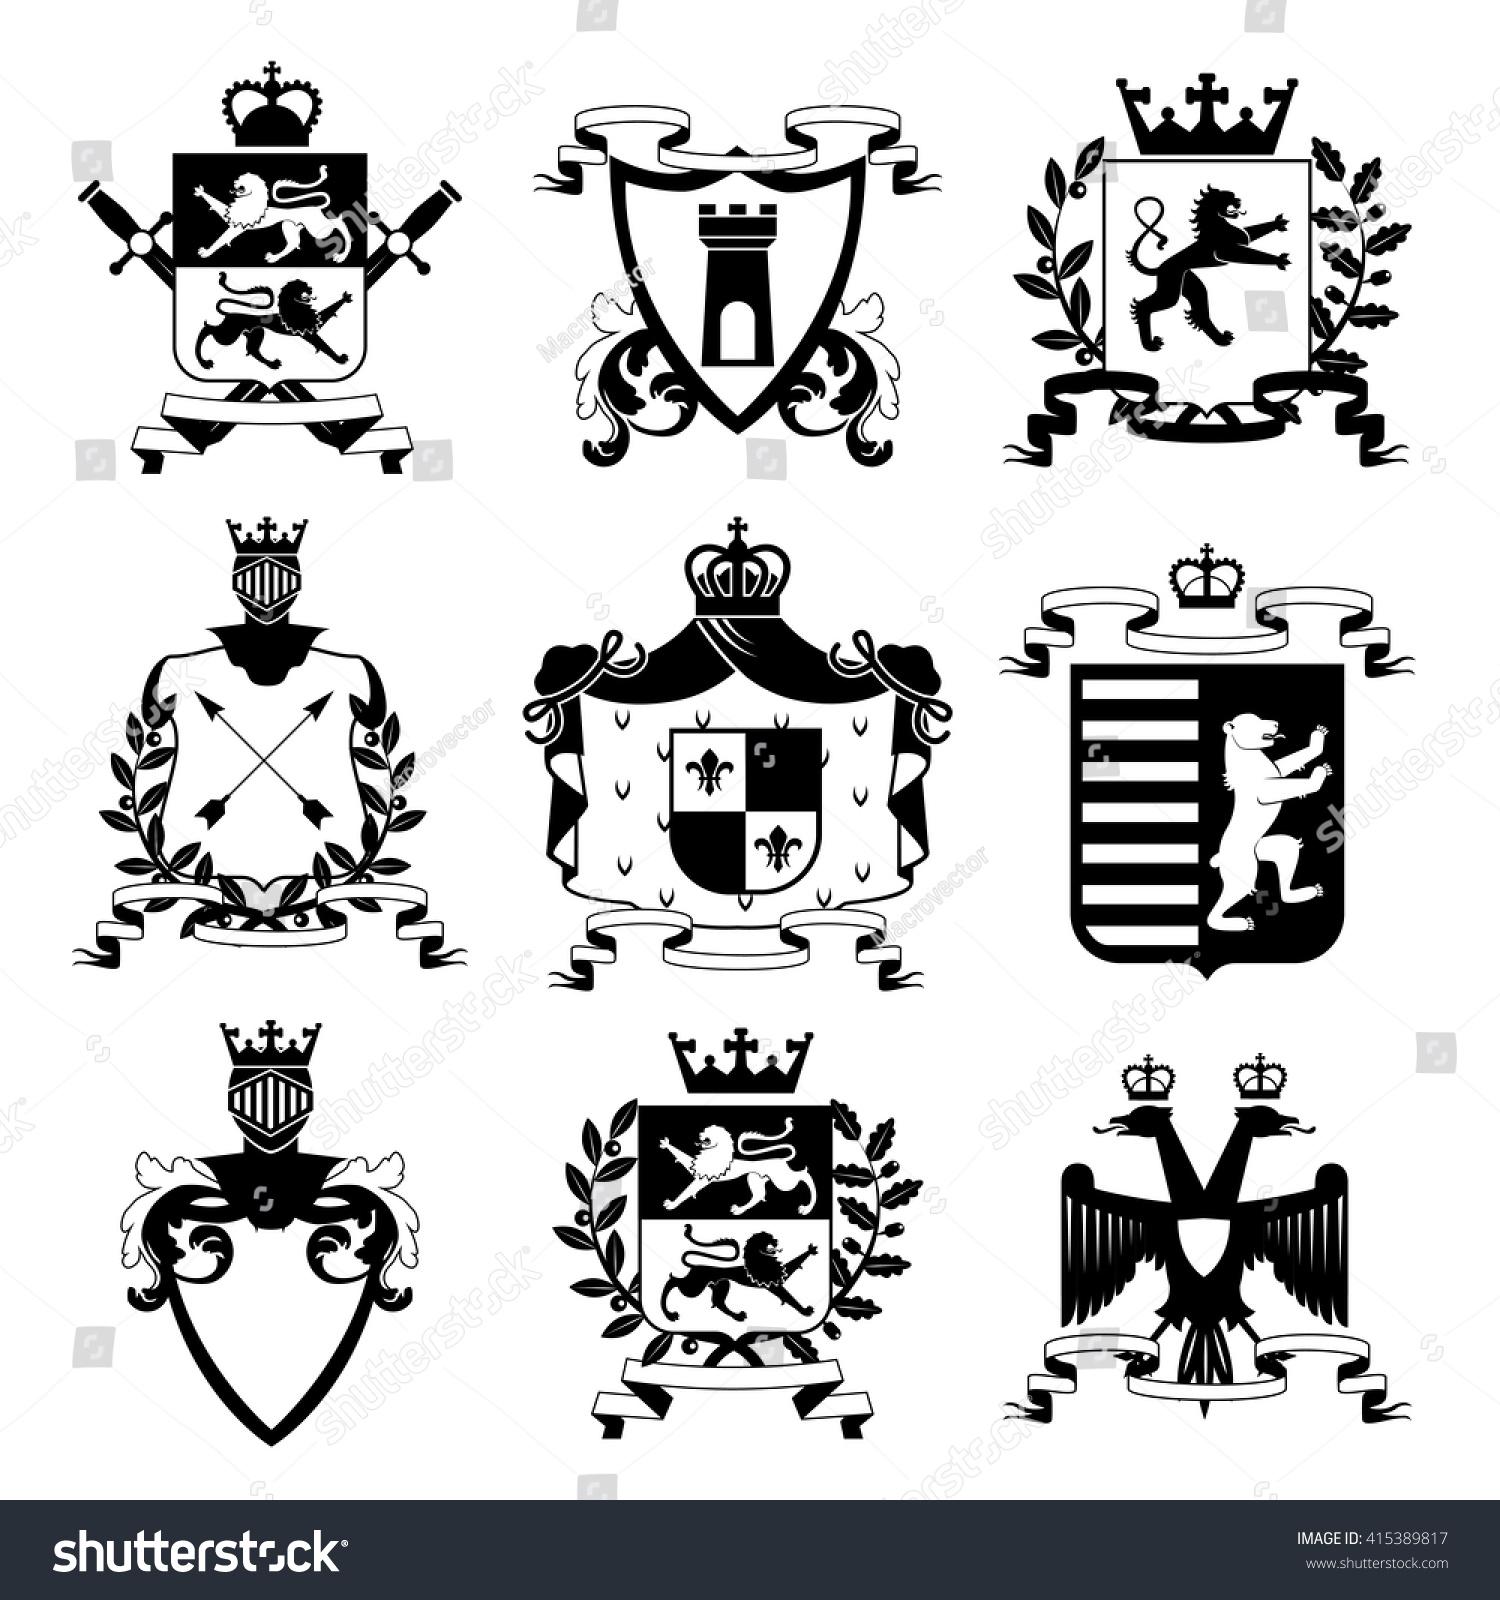 Heraldic Coat Arms Family Crest Shields Stock Vector 415389817 ...